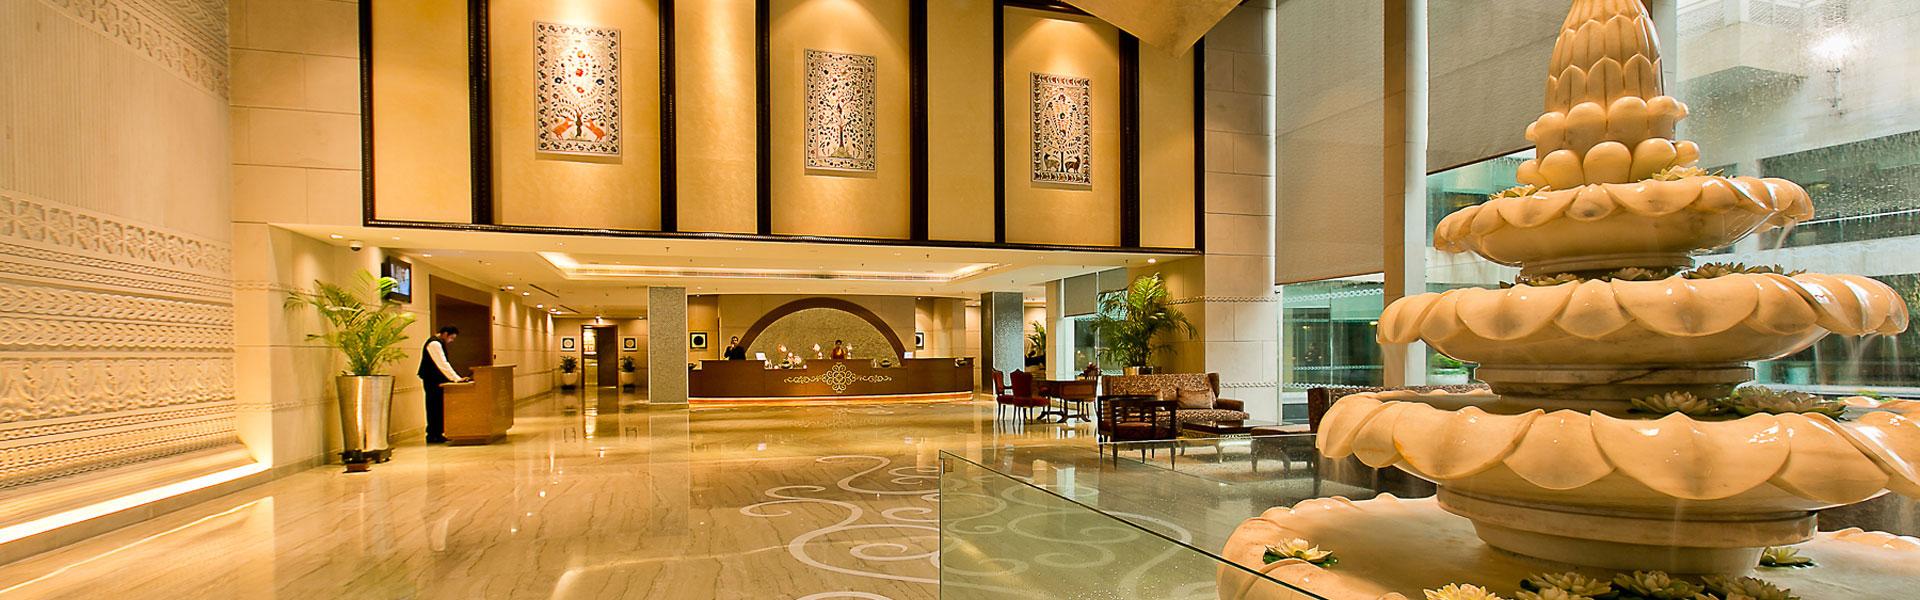 Largest hotel Lobby